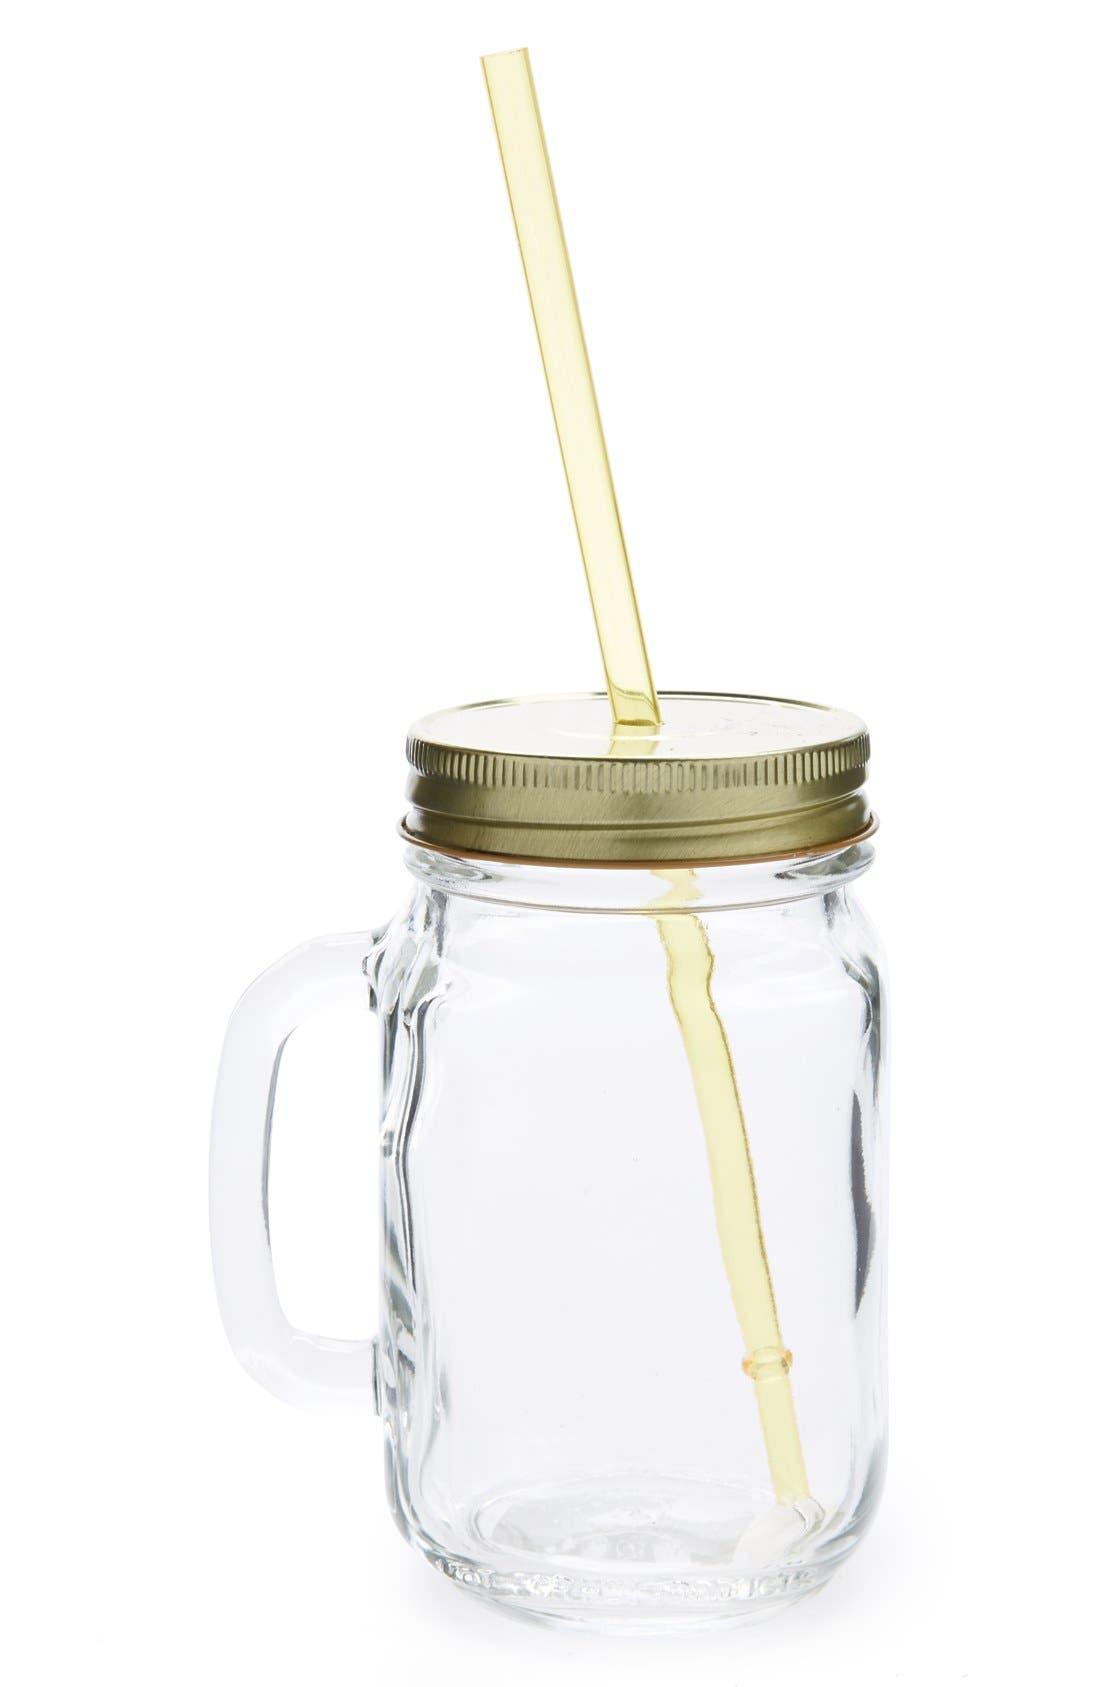 Alternate Image 1 Selected - Ad-N-Art 'Shindig' Glass Mug